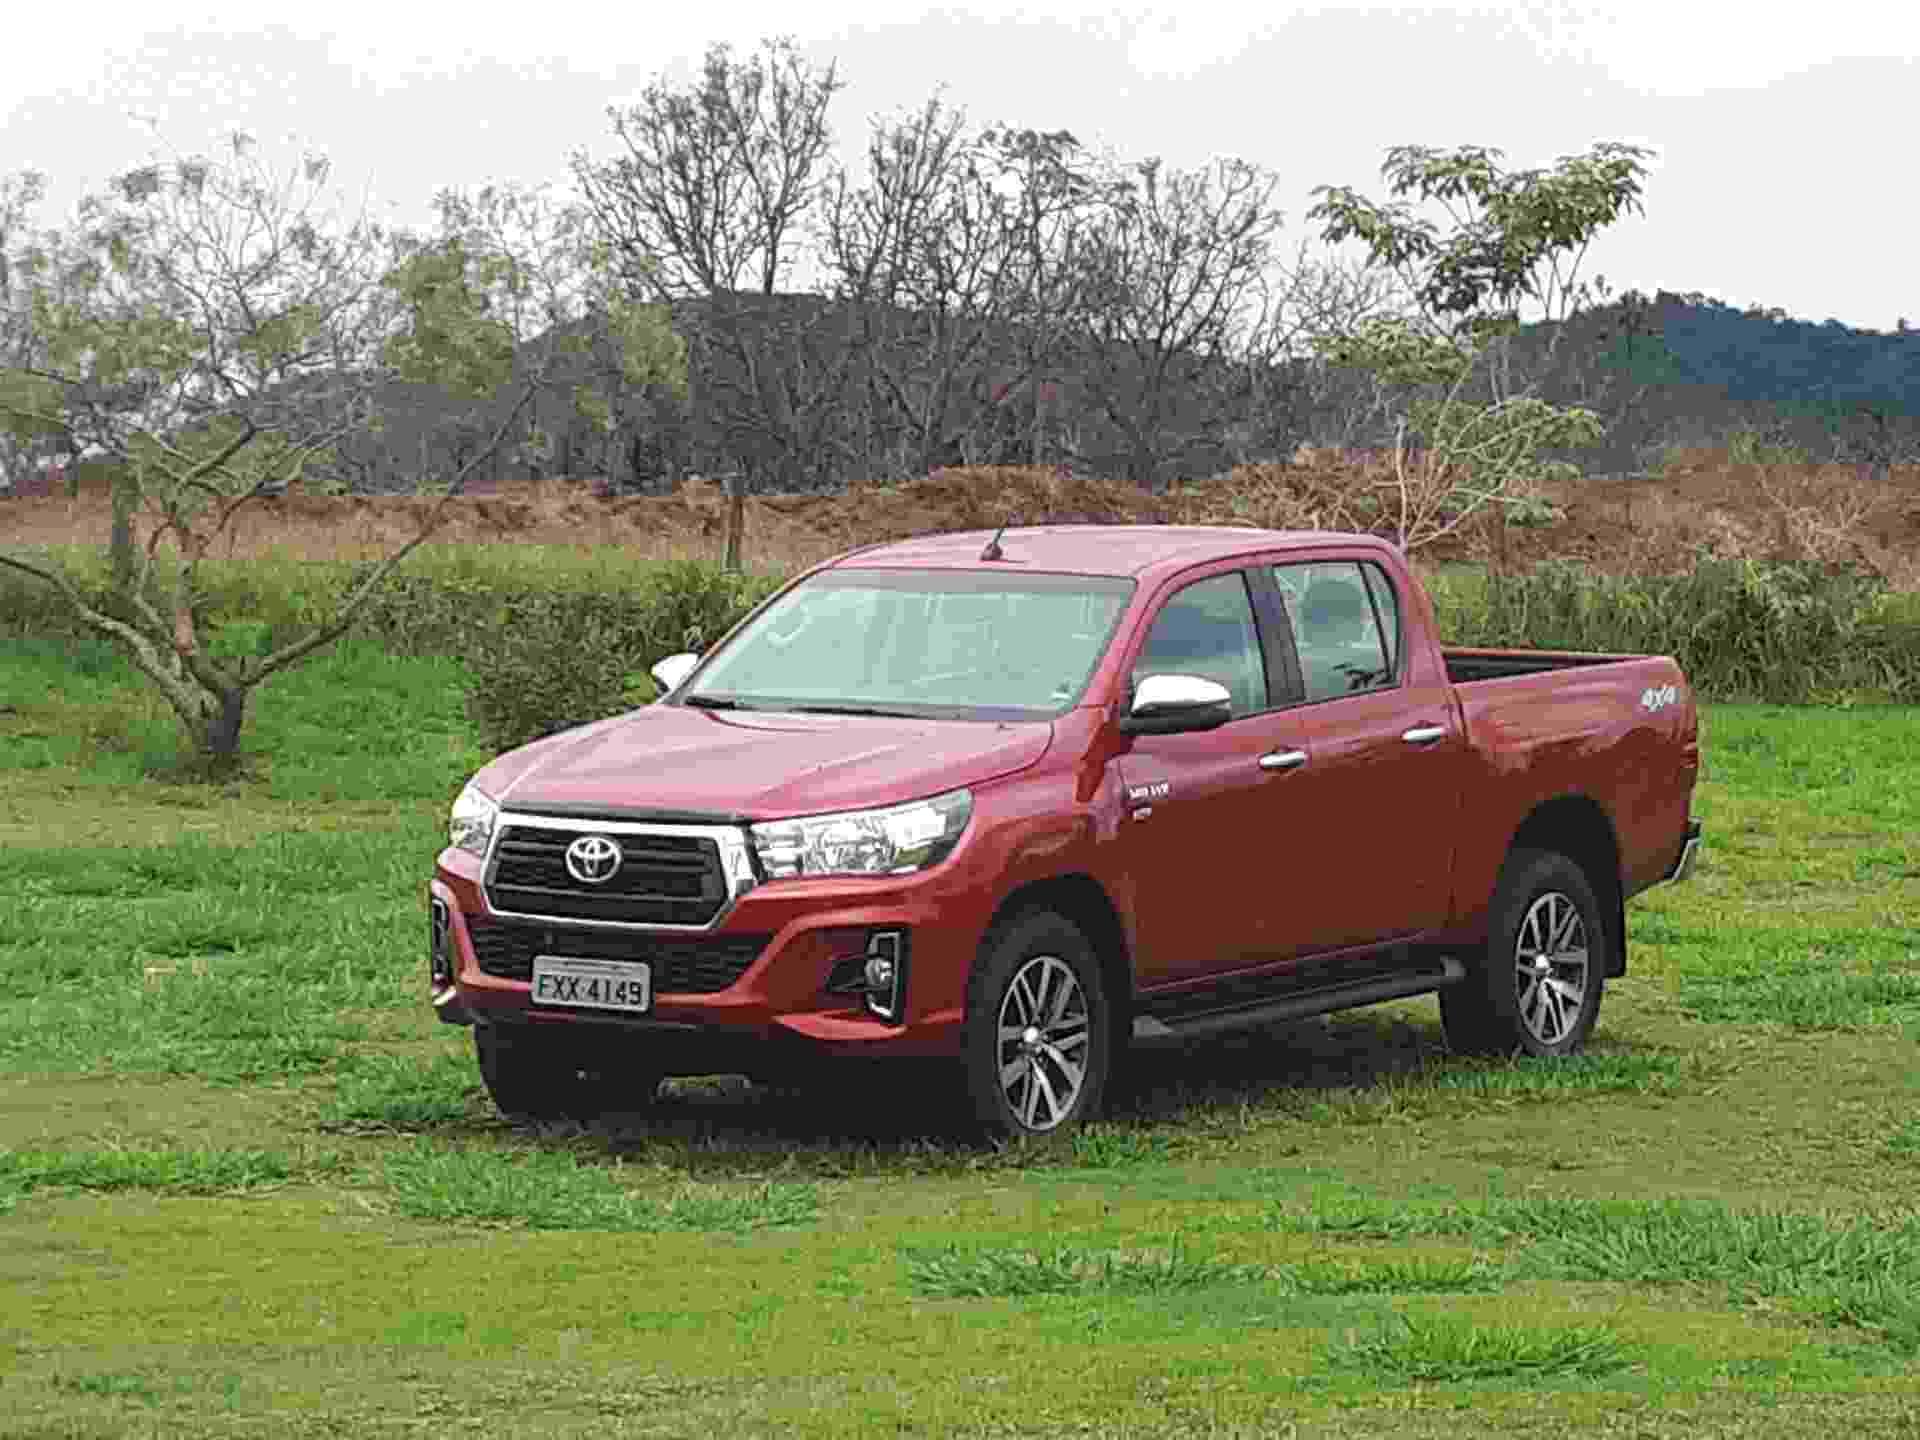 Toyota Hilux SRV Flex - Vitor Matsubara/UOL